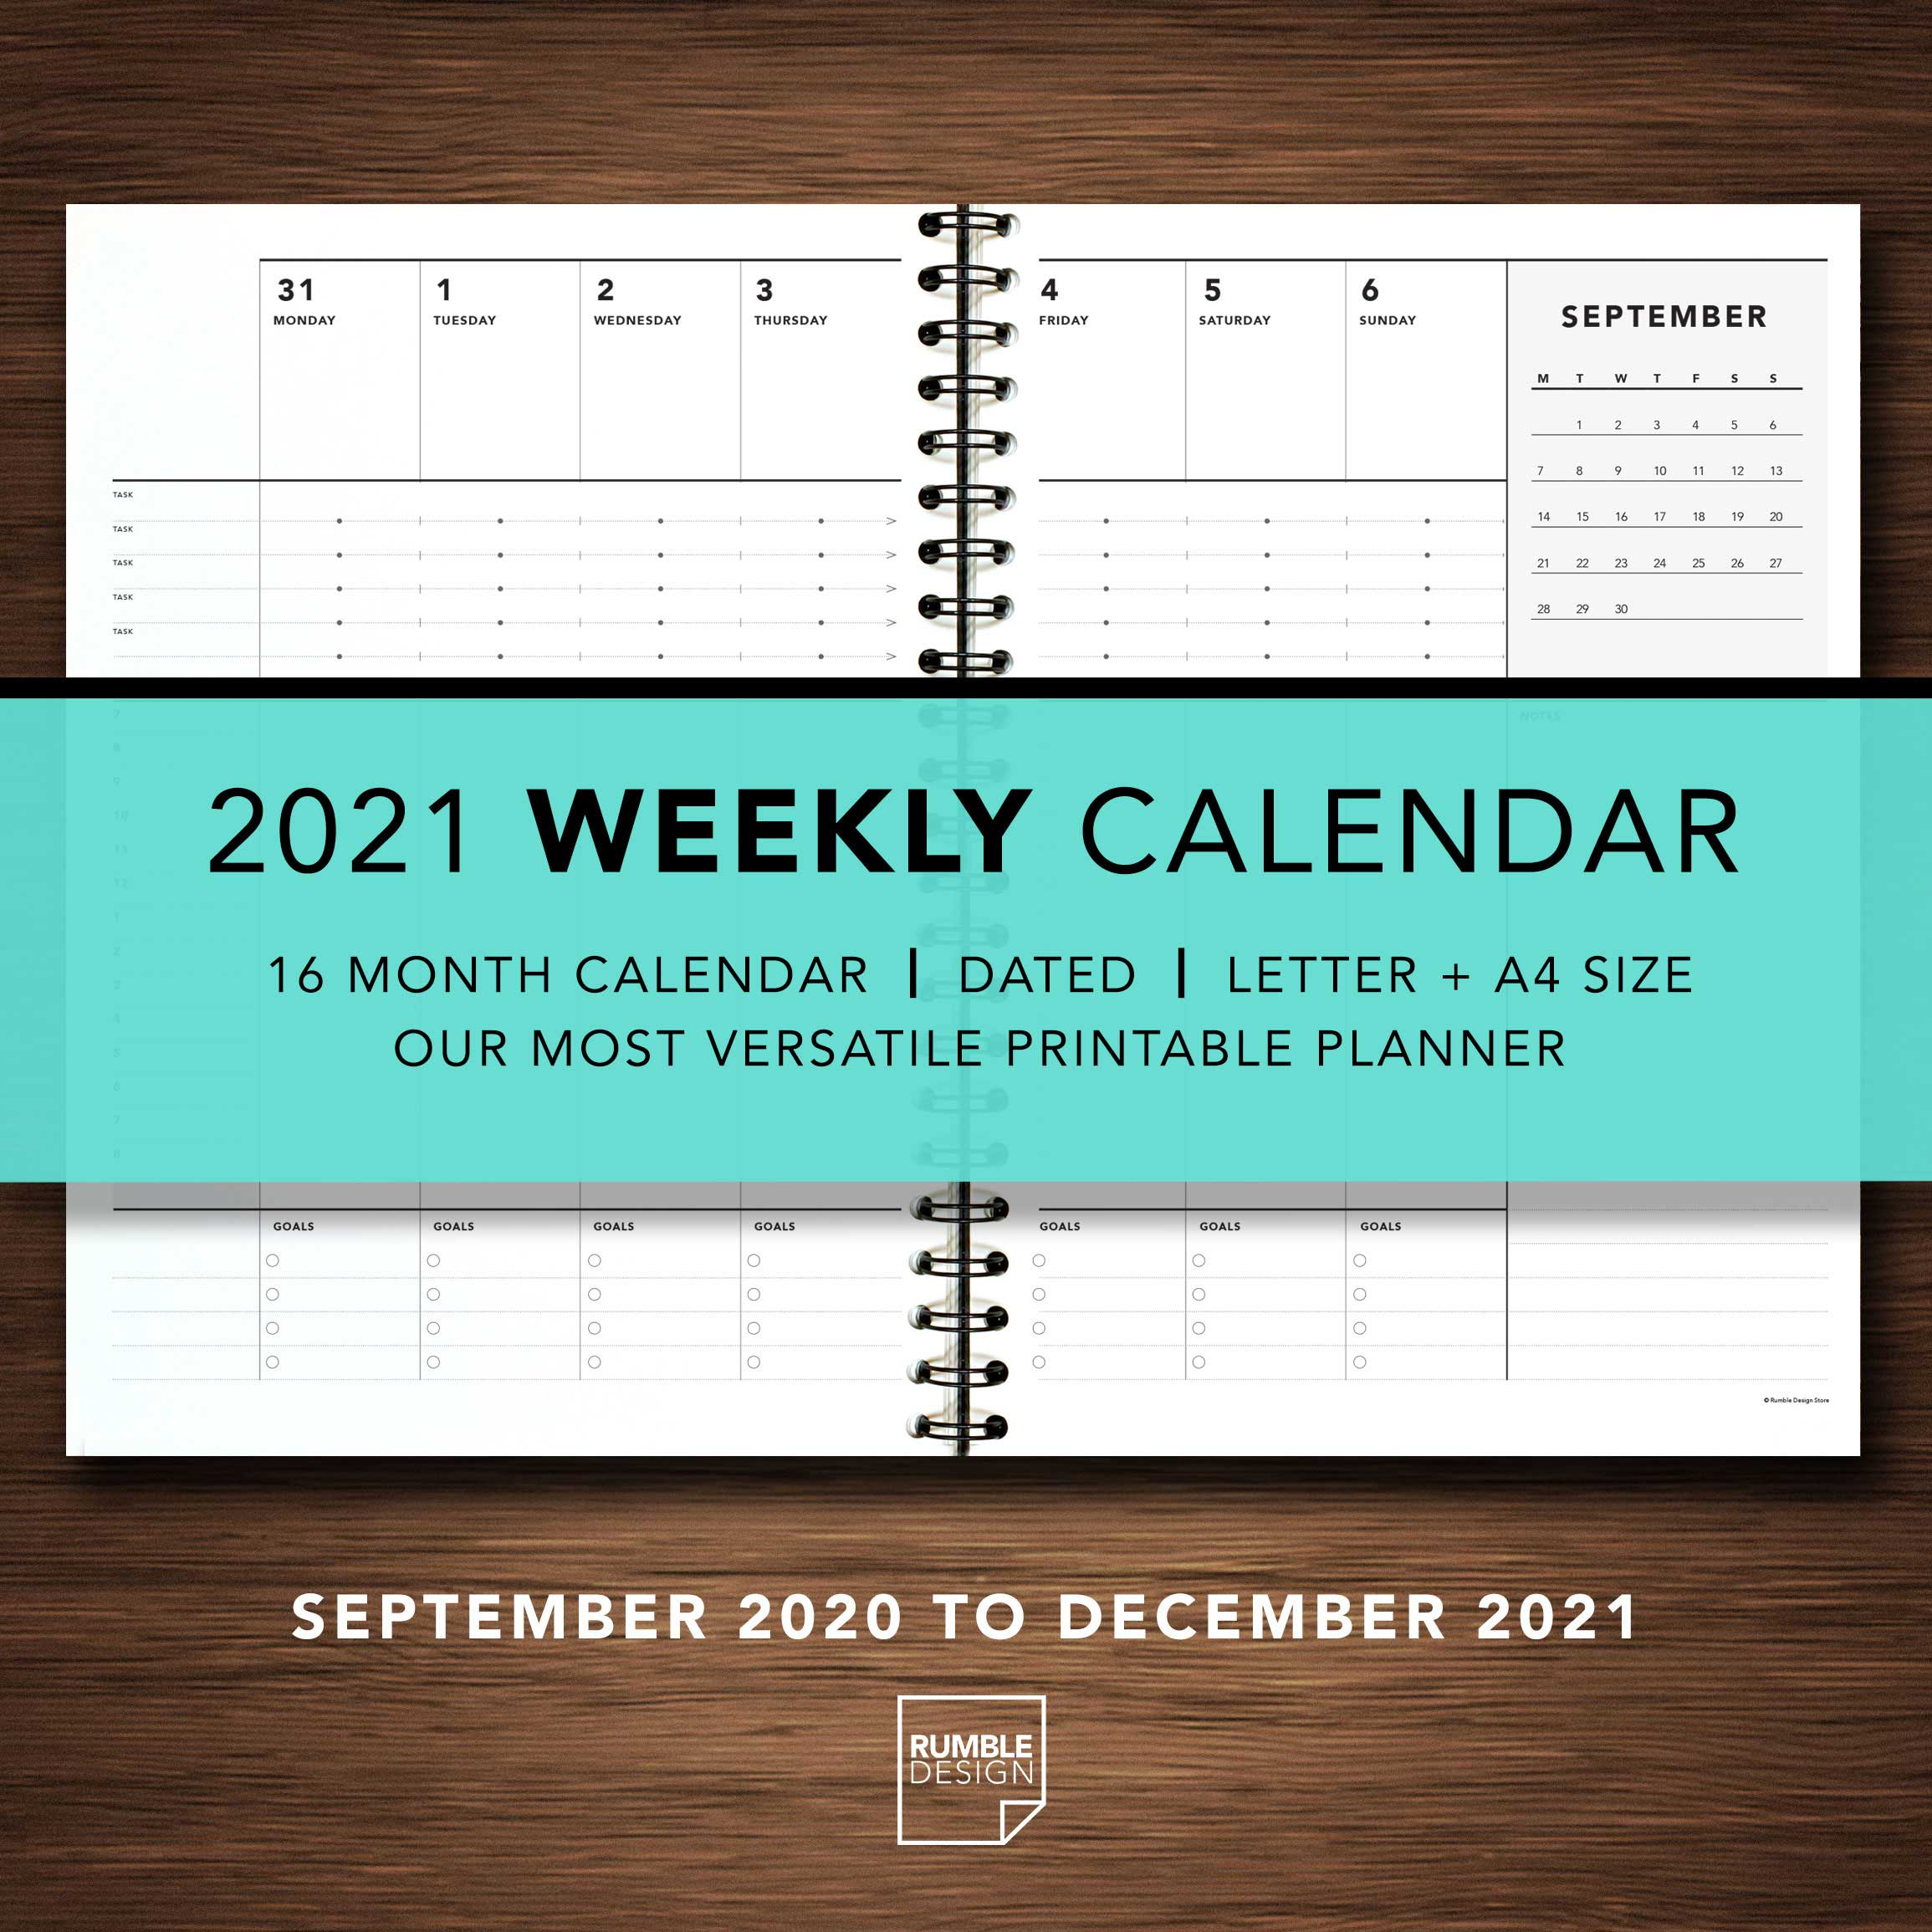 2021 Weekly Calendar Rumble Design Store